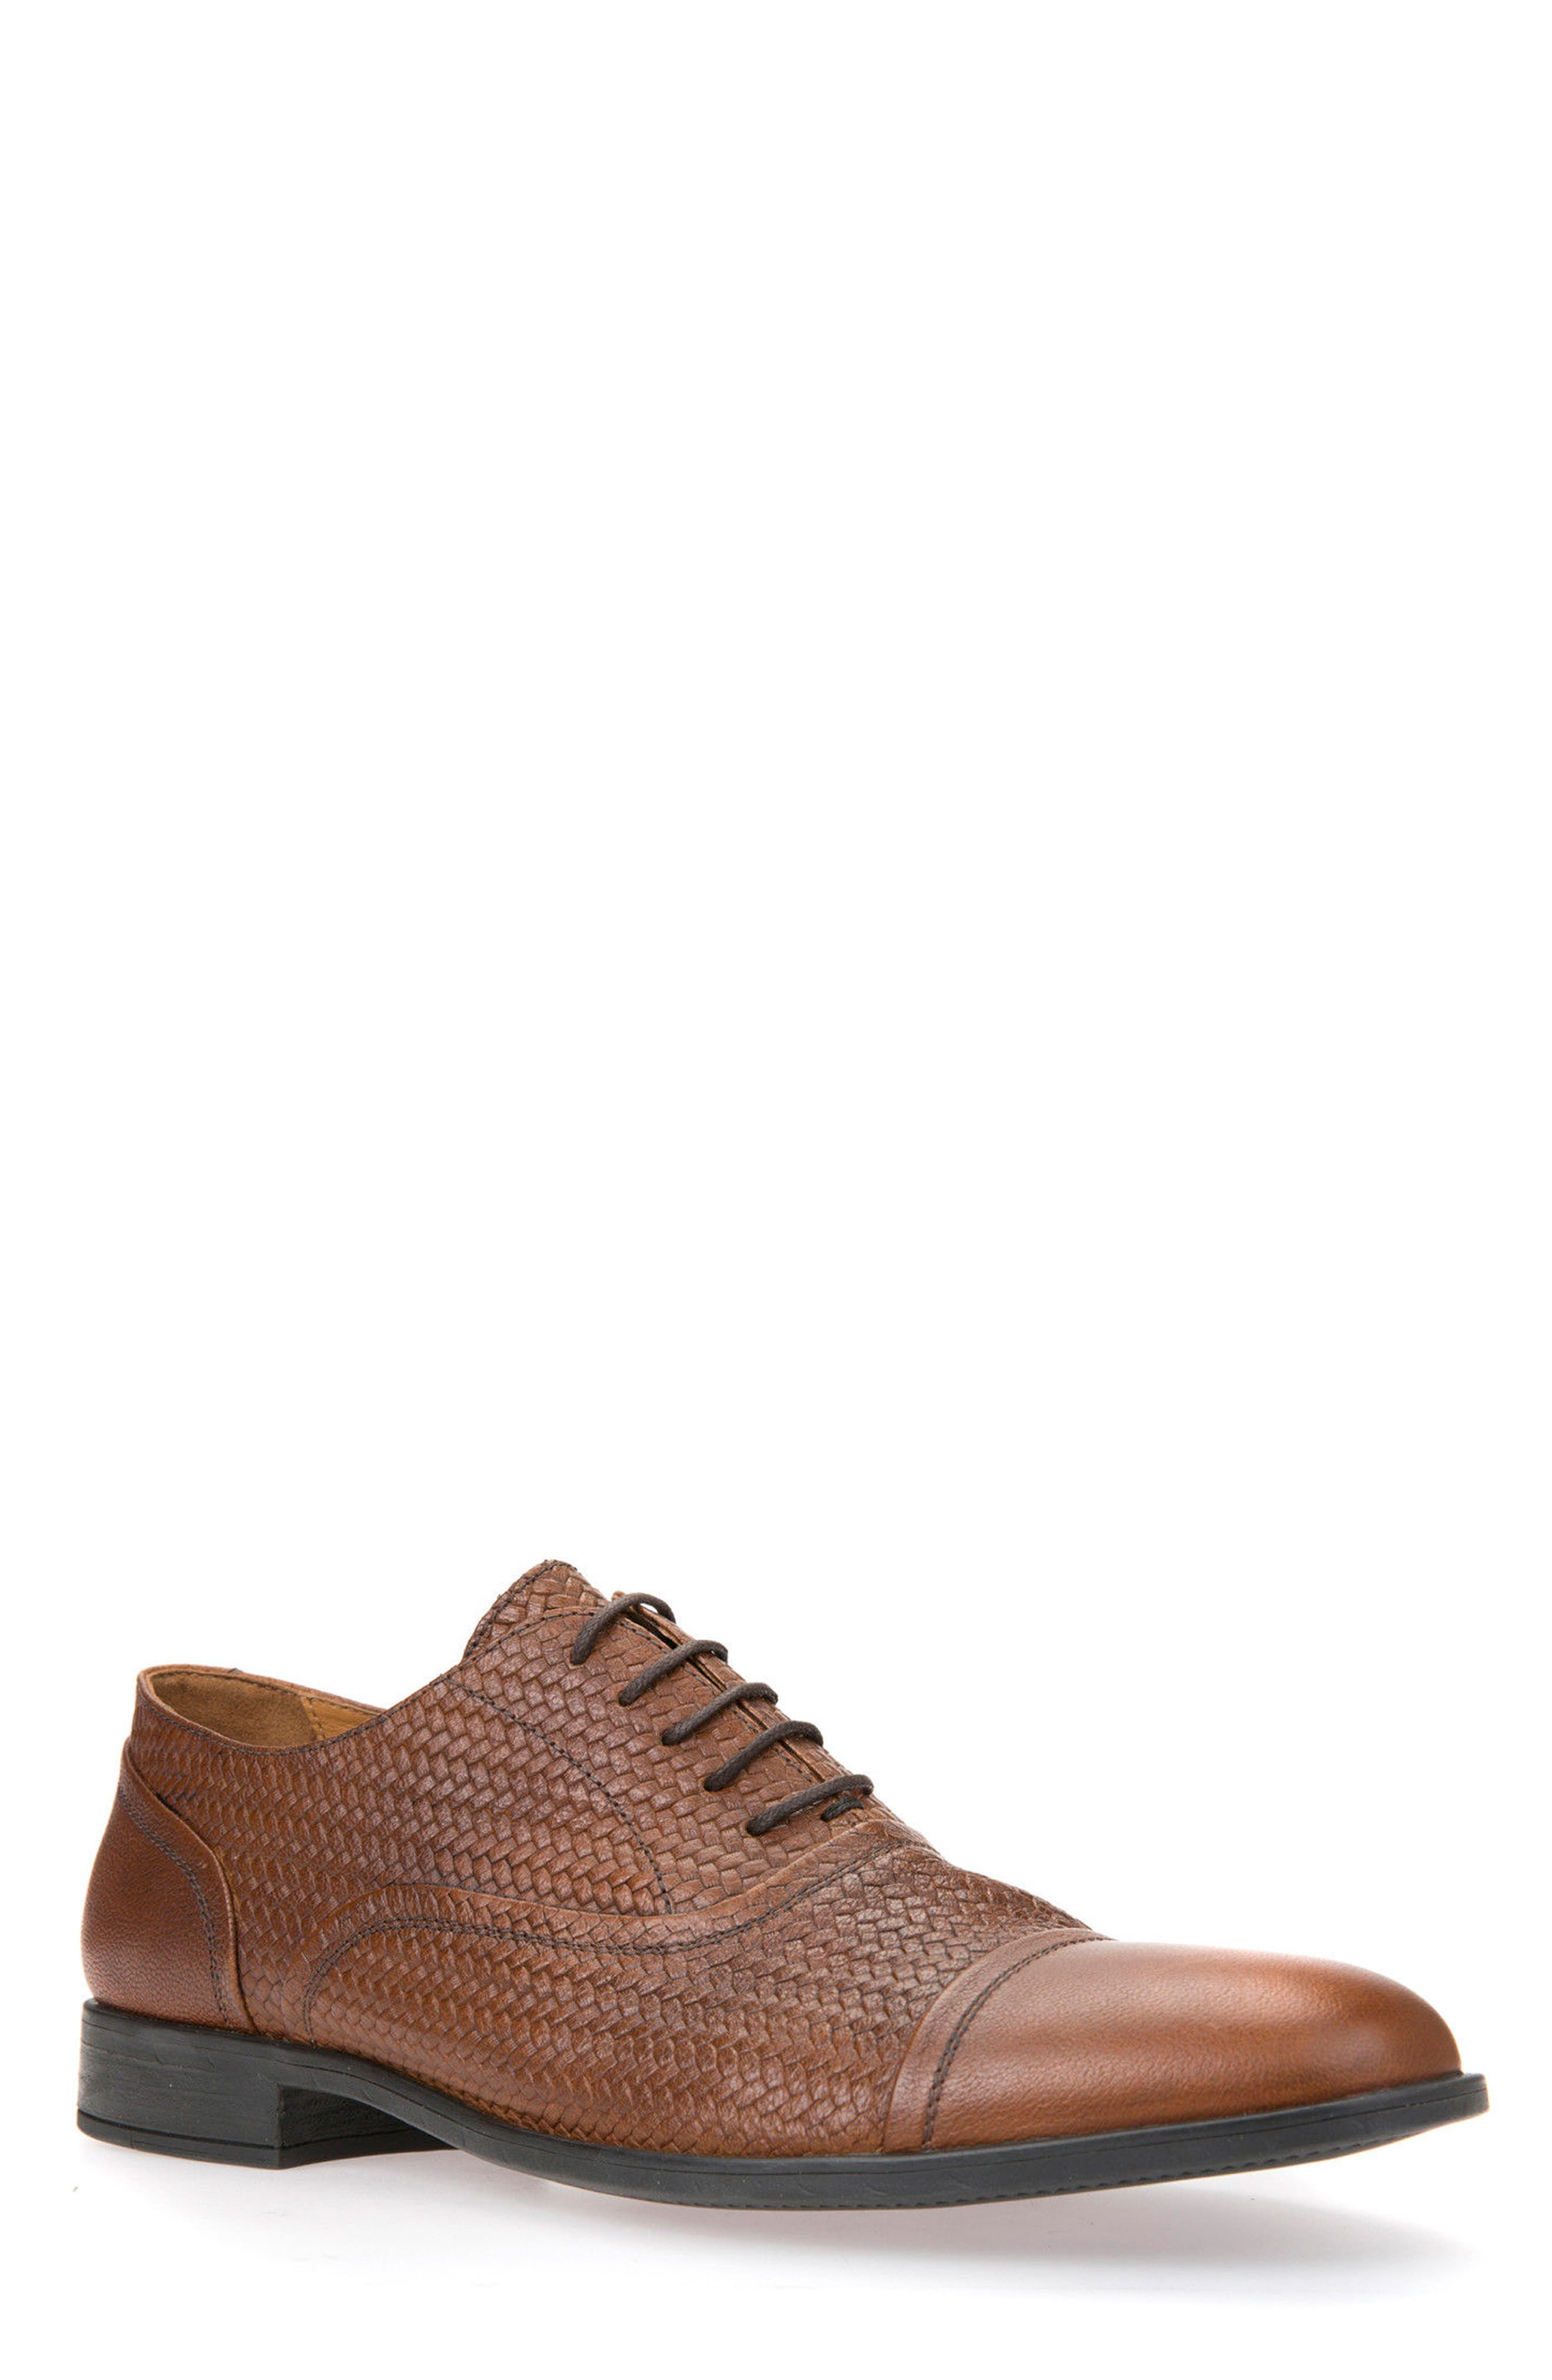 Alternate Image 1 Selected - Geox Bryceton Textured Cap Toe Oxford (Men)